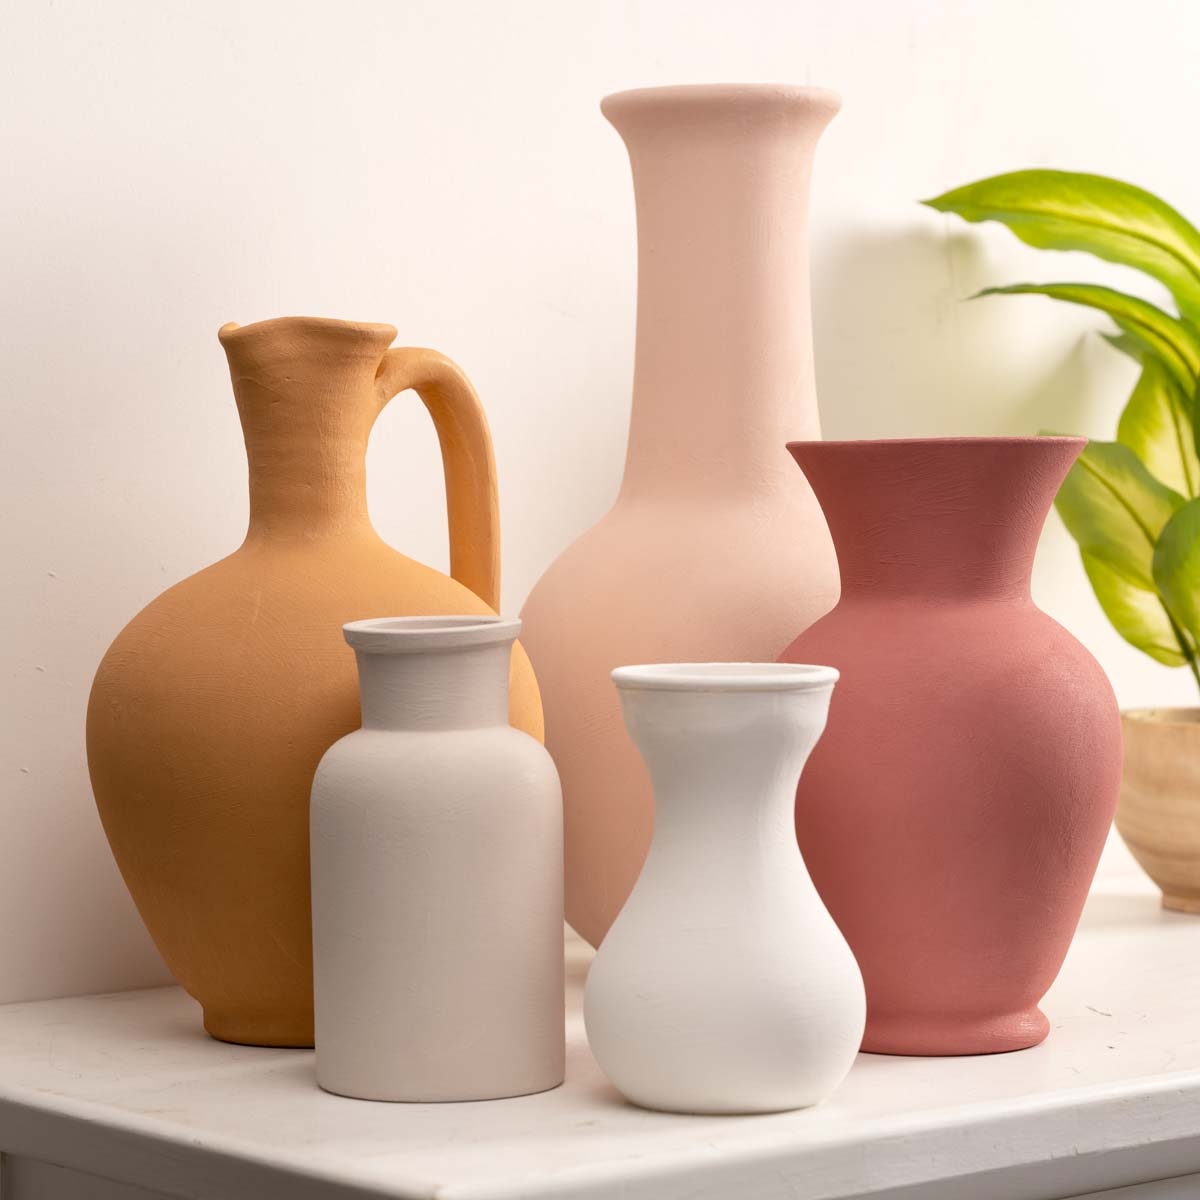 FolkArt ® Terra Cotta™ Acrylic Paint - Red Clay, 2 oz. - 7017